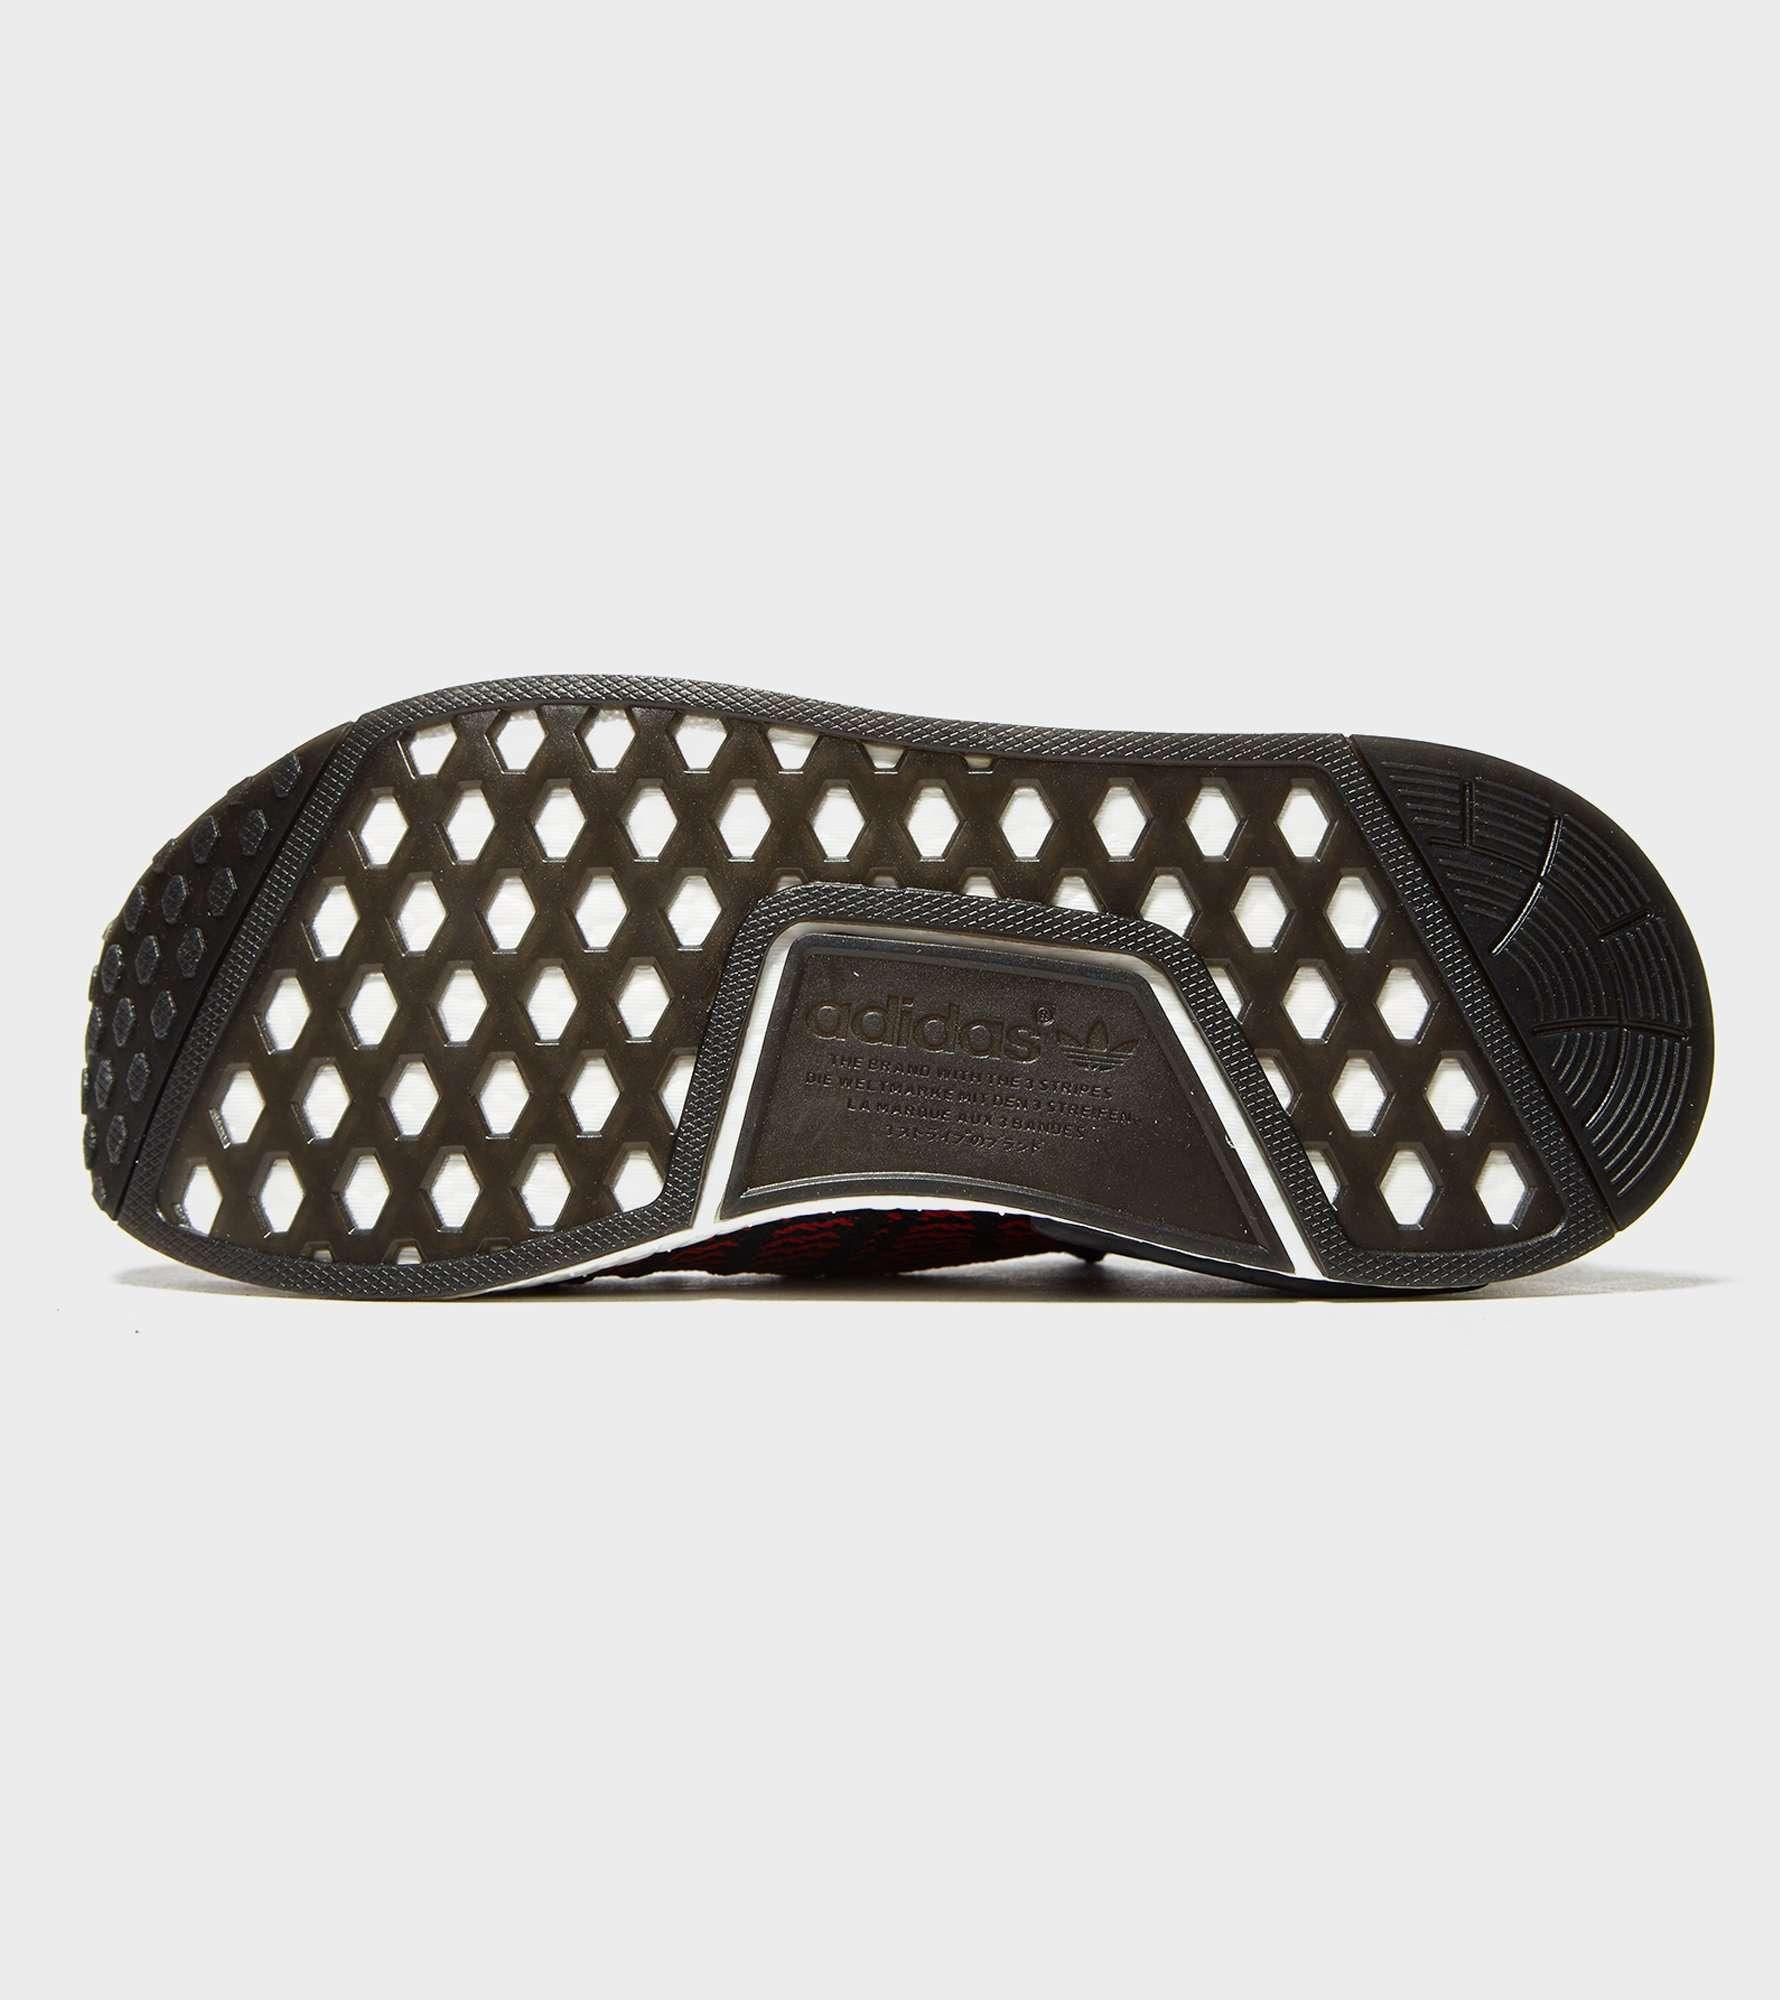 adidas Originals NMD R1 STLT